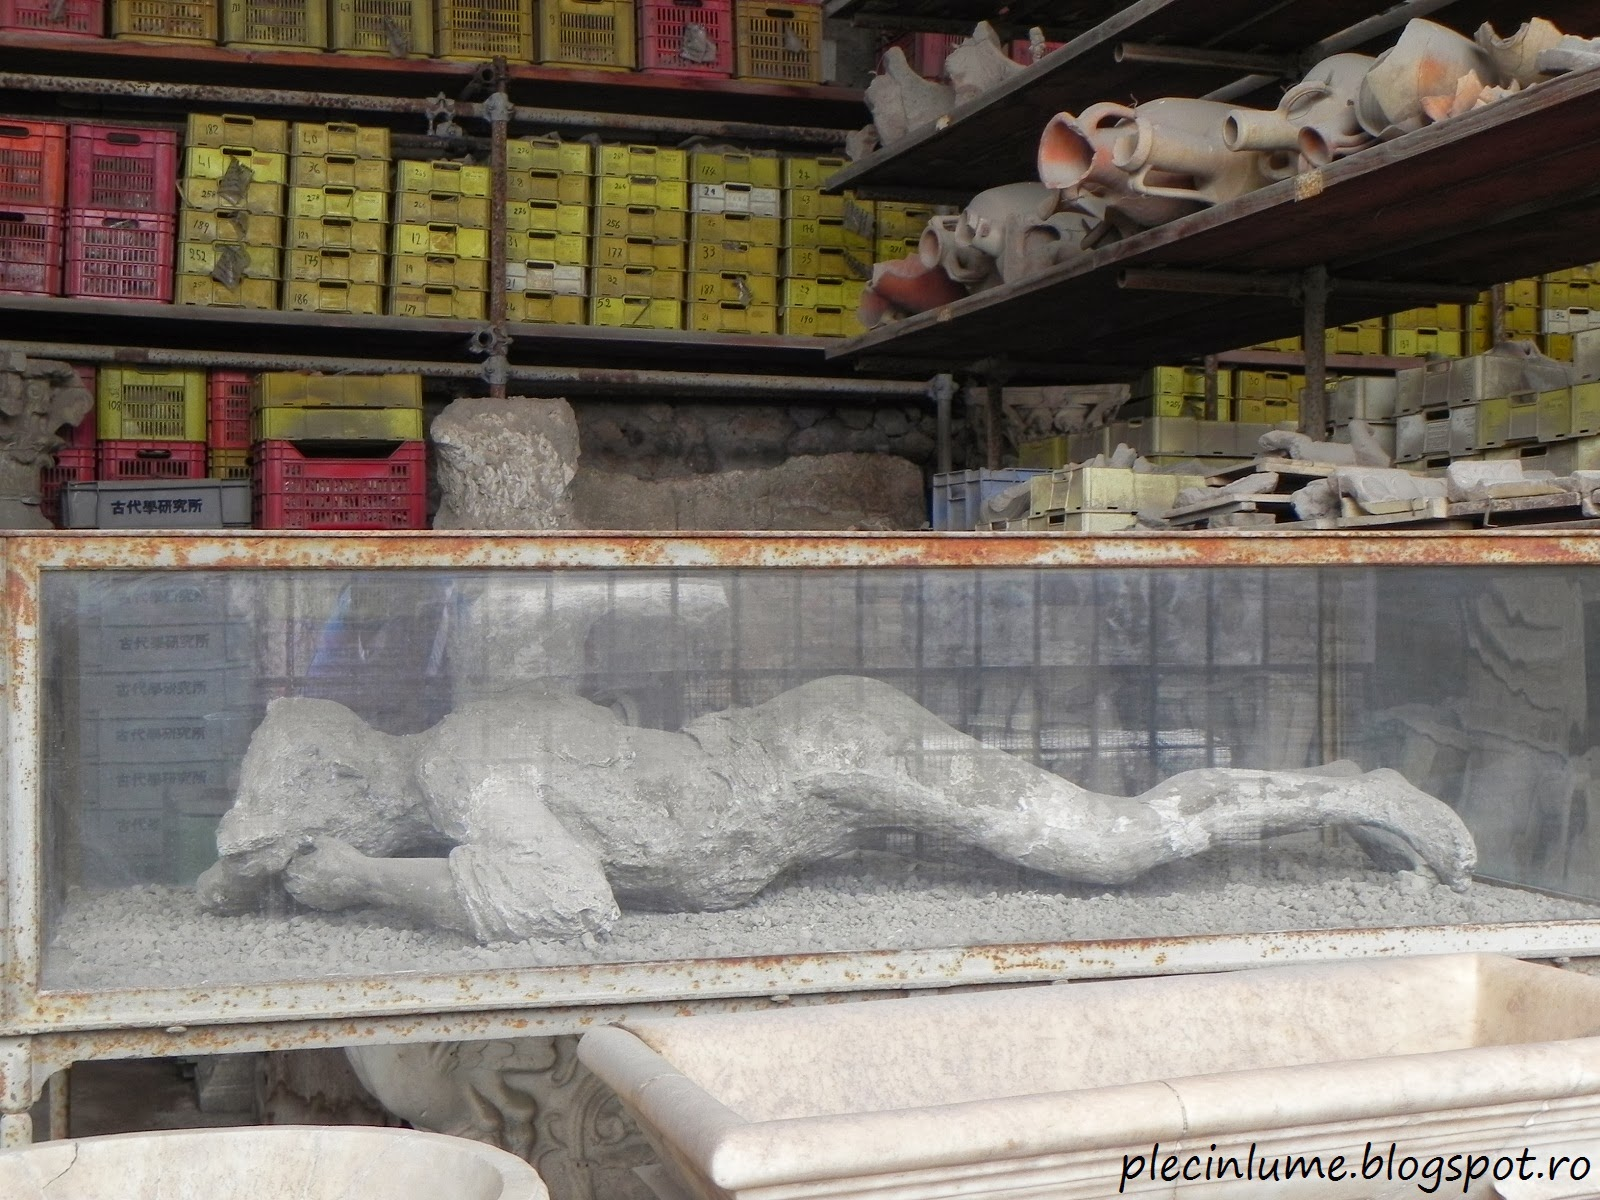 Femeie insarcinata gasita la Pompei